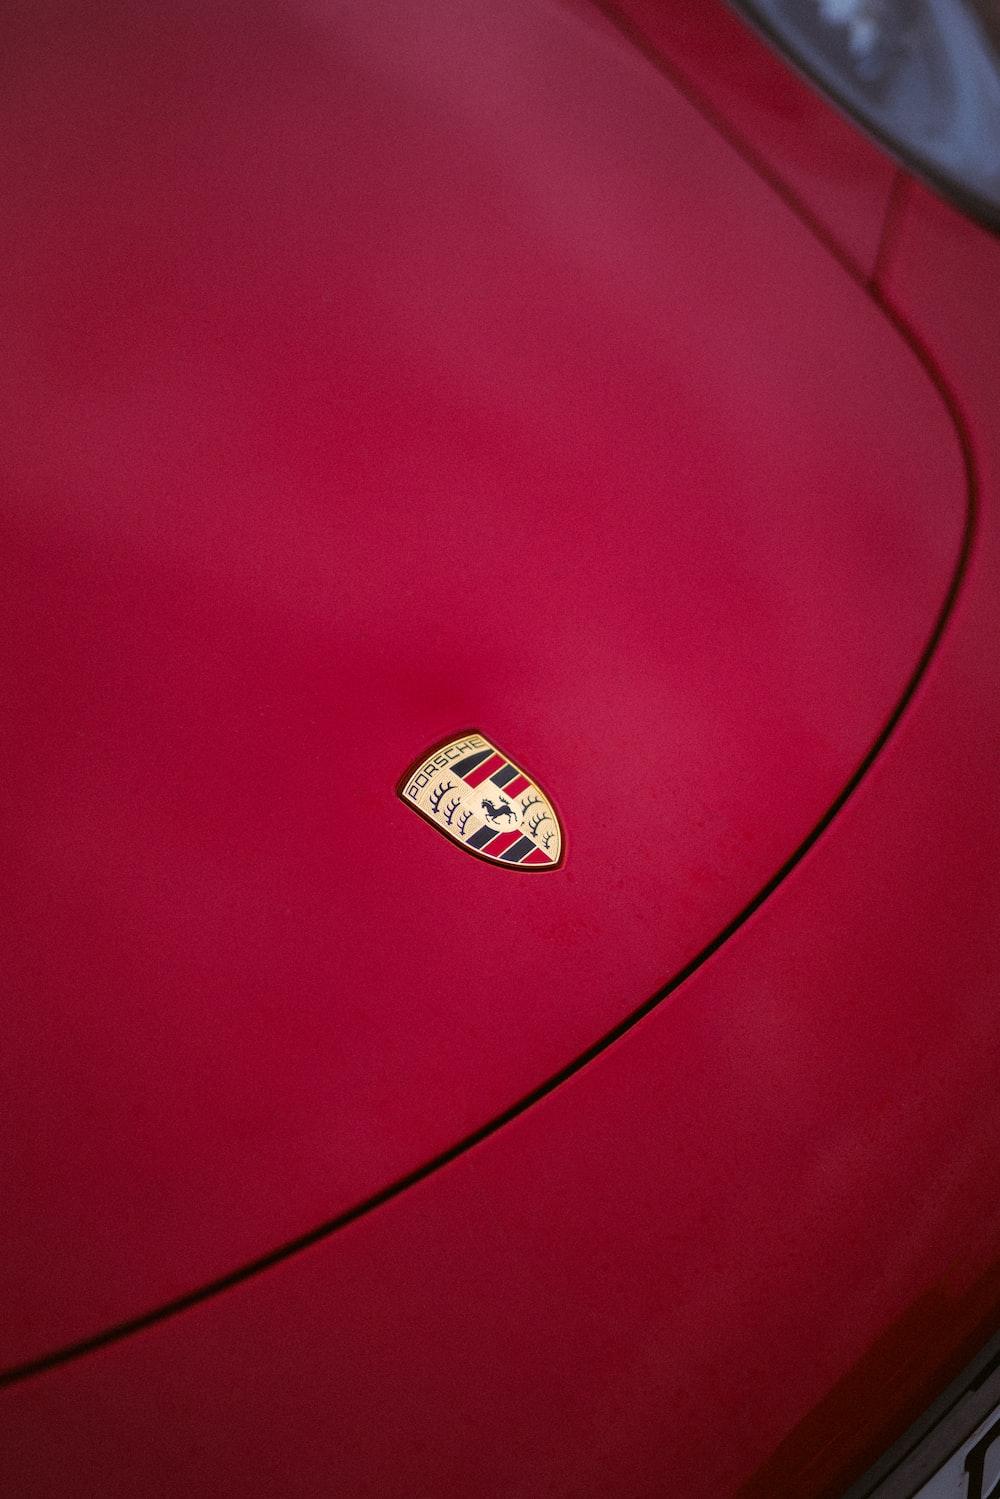 red Porsche Carrera